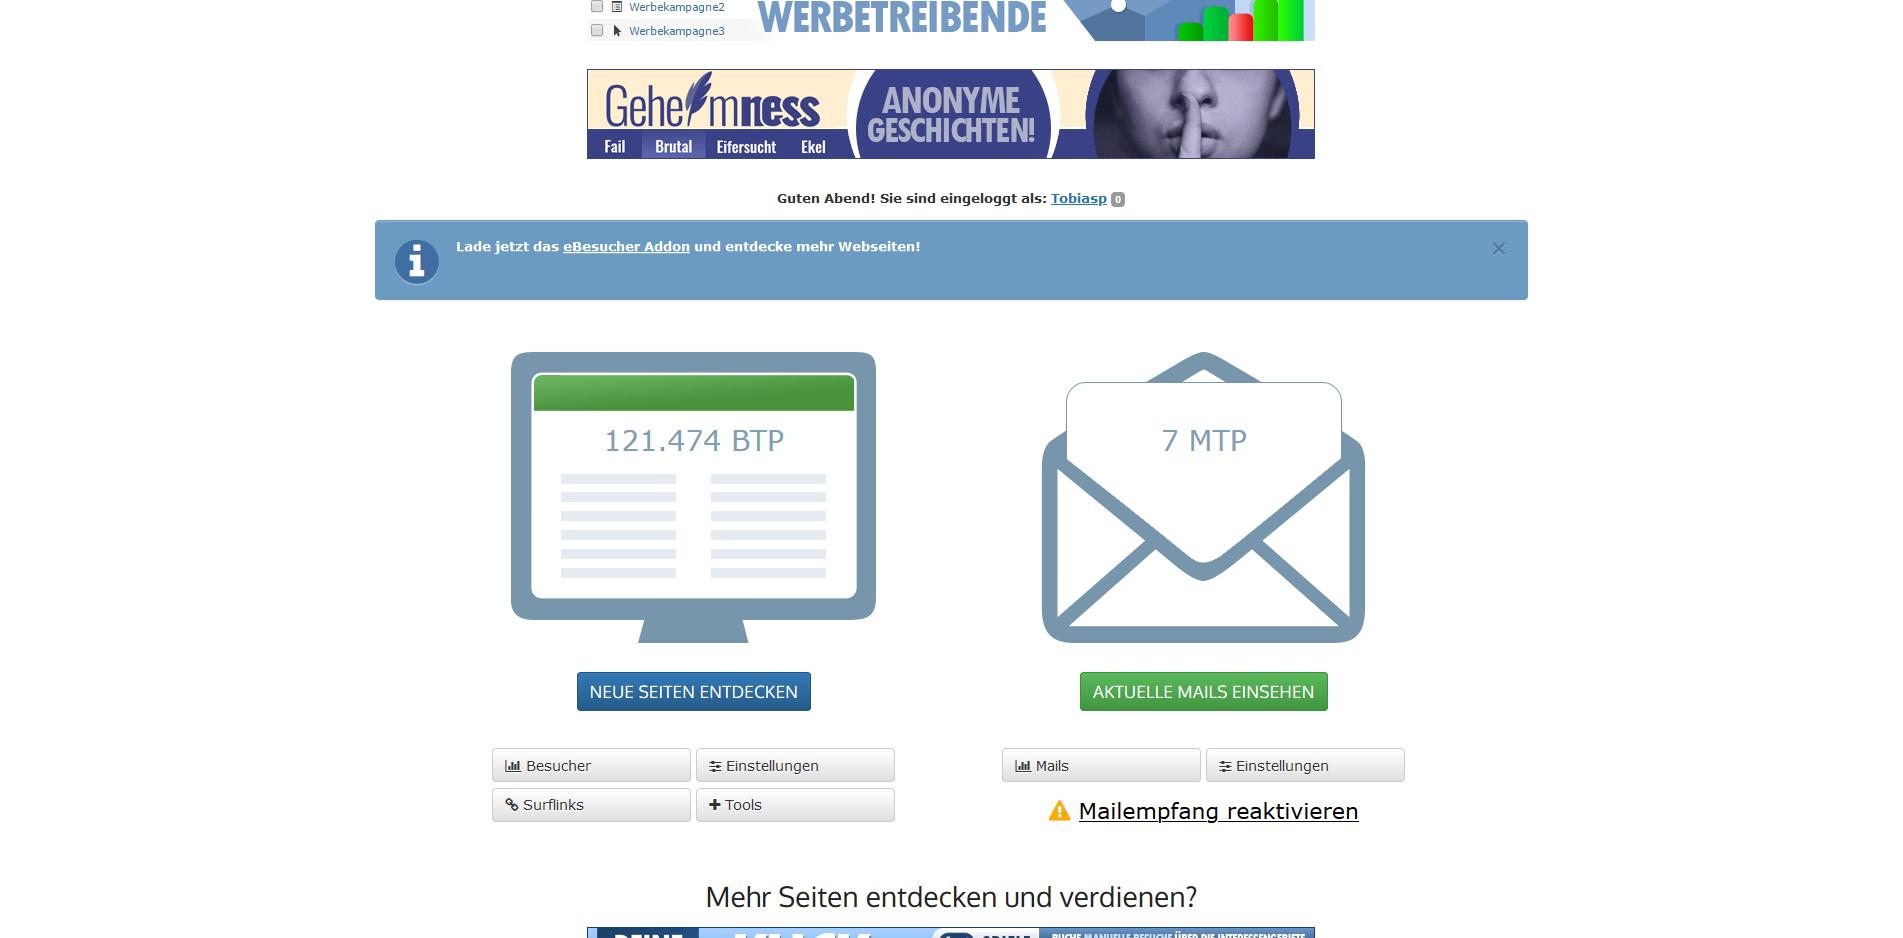 [Bild: Screenshot_2020-09-02-Webseiten-finden-G...her-de.png]